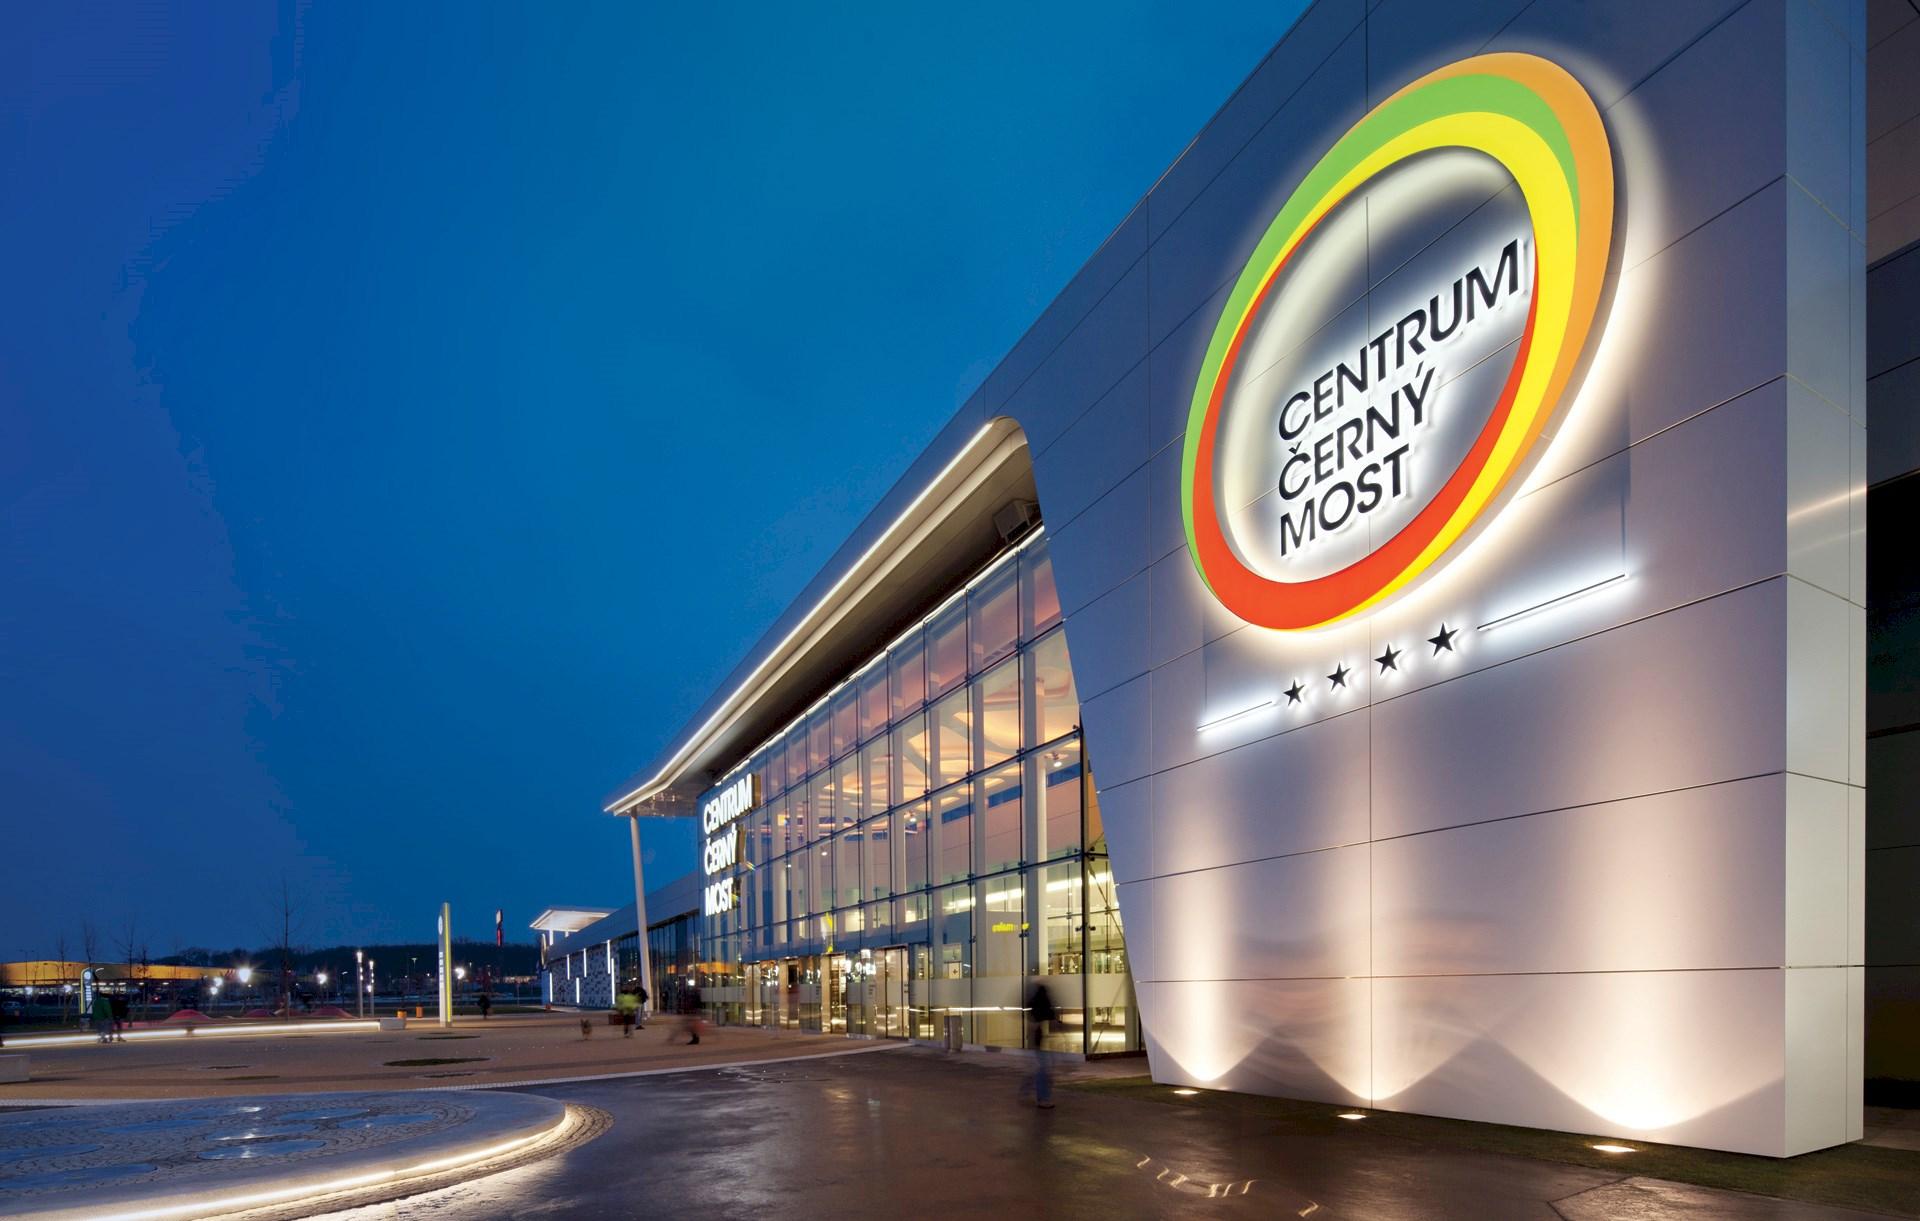 Centrum Černý Most Wins ICSC Europe Award